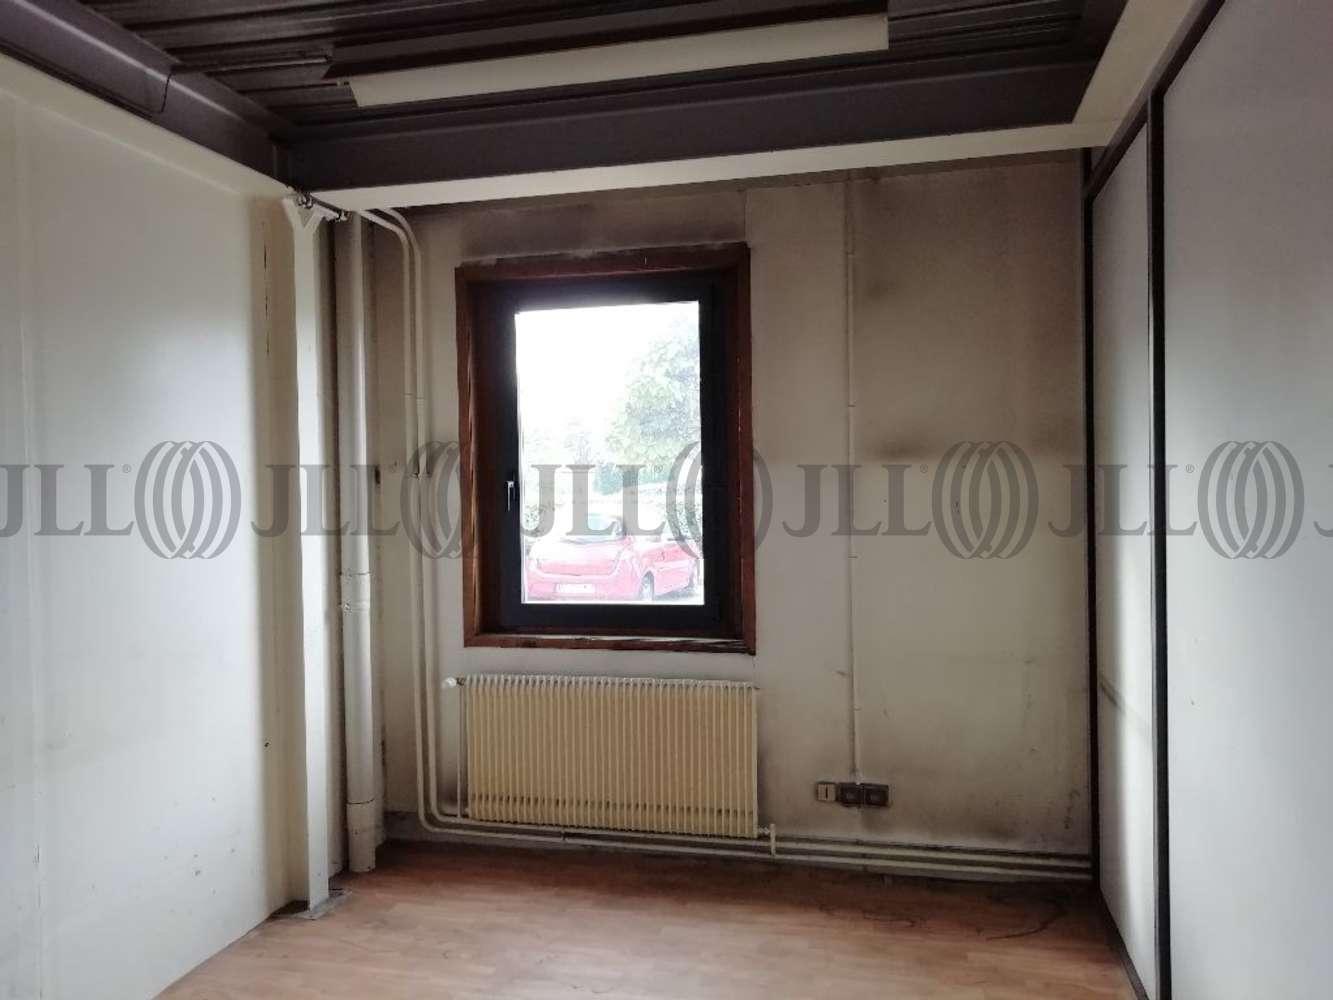 Activités/entrepôt Dardilly, 69570 - Location locaux d'activité Dardilly Lyon - 10815379